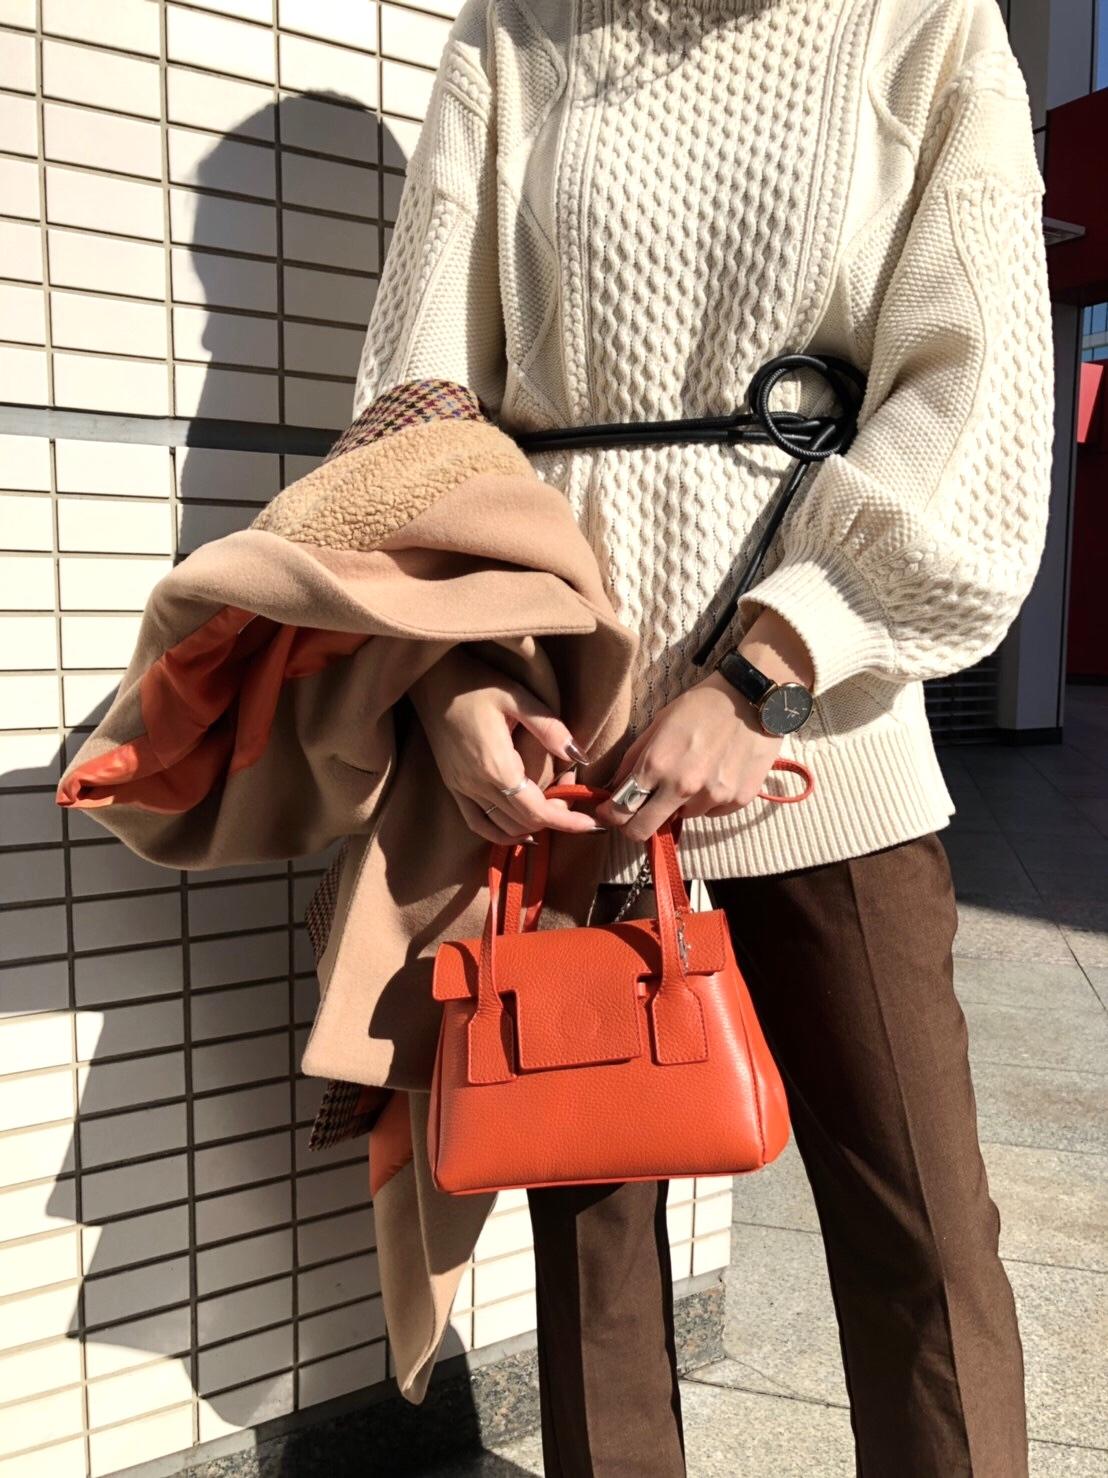 MILOS ミロス scrapbook スクラップ ブック バッグ bag ミニトートバッグ 牛革 東武池袋 池袋東武 東武百貨店